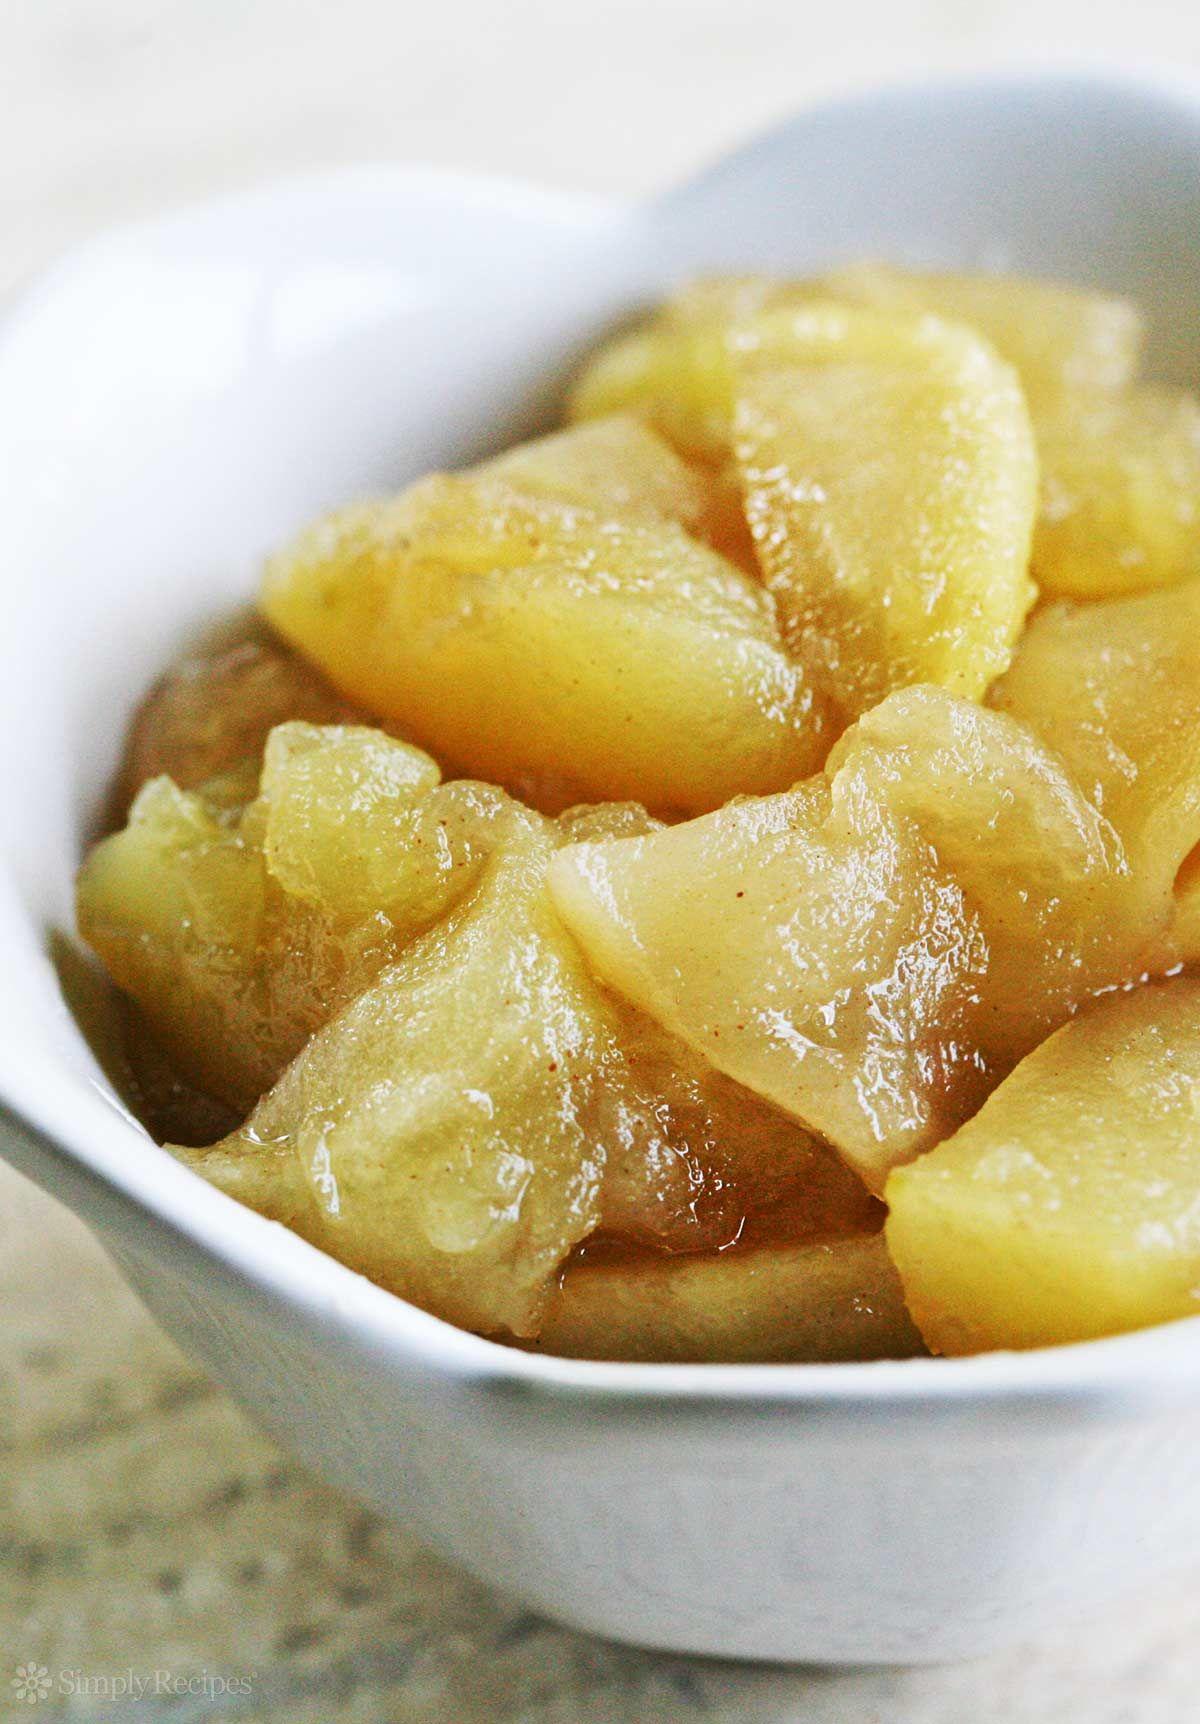 EASY Baked Apple Slices Recipe Easy baked apples